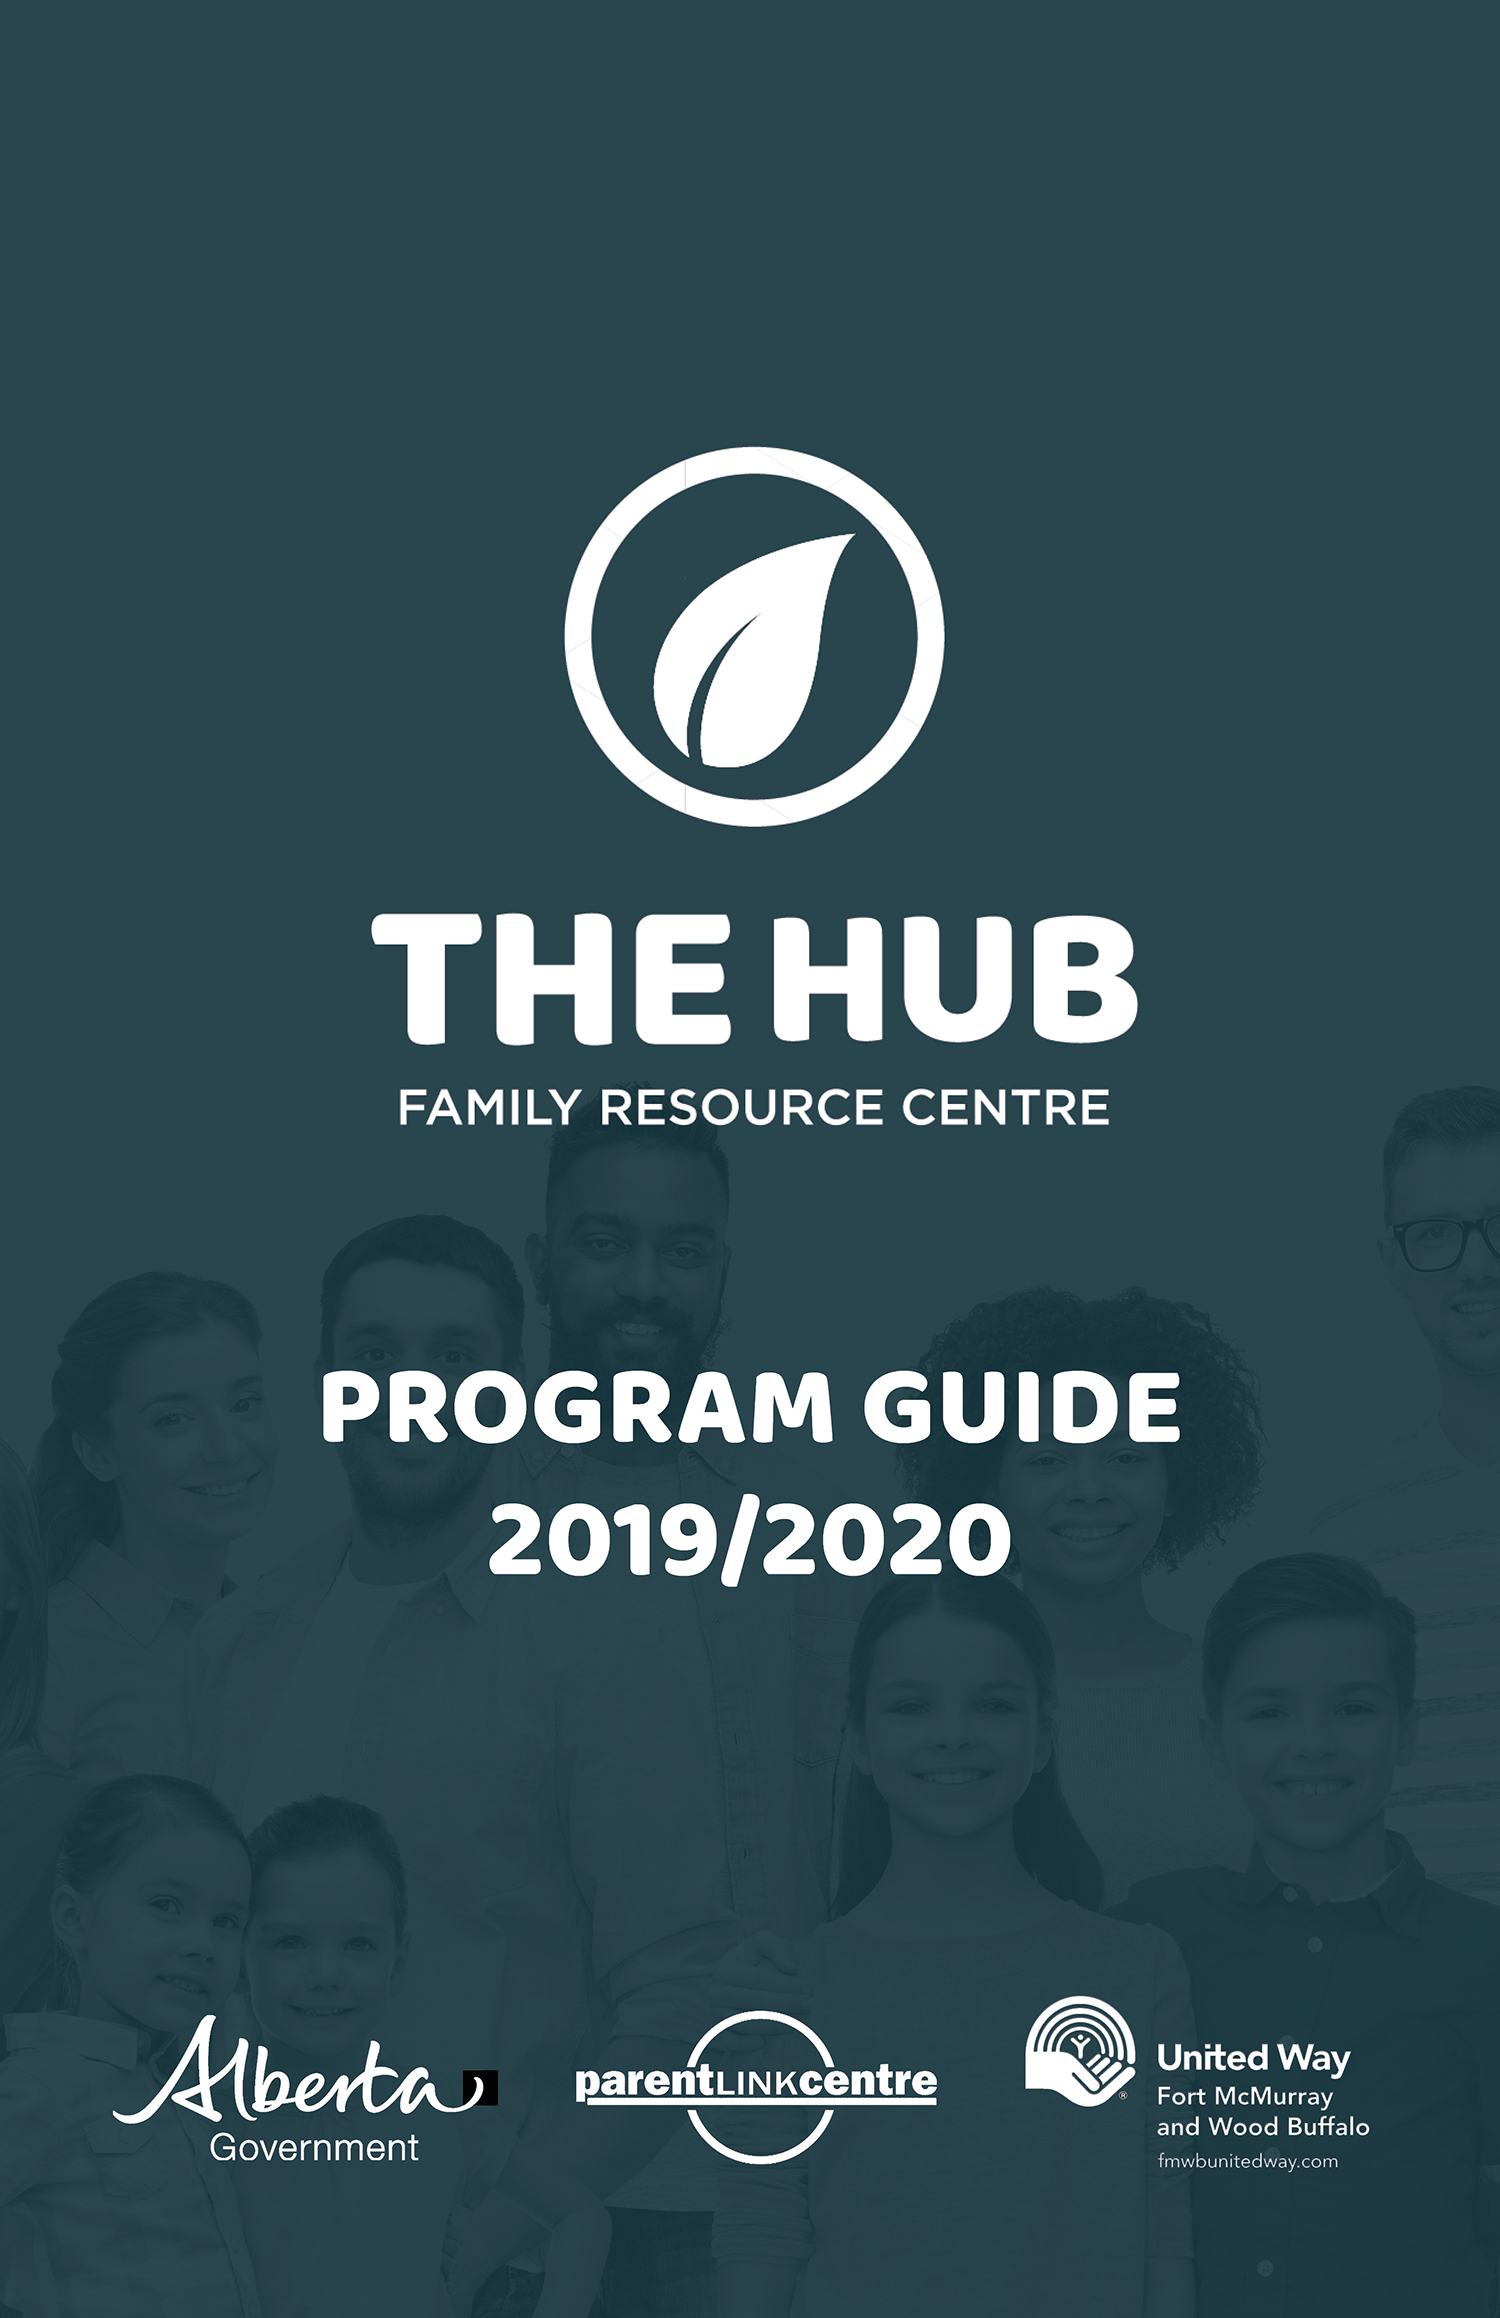 program guide 201920FINALFINAL.jpg